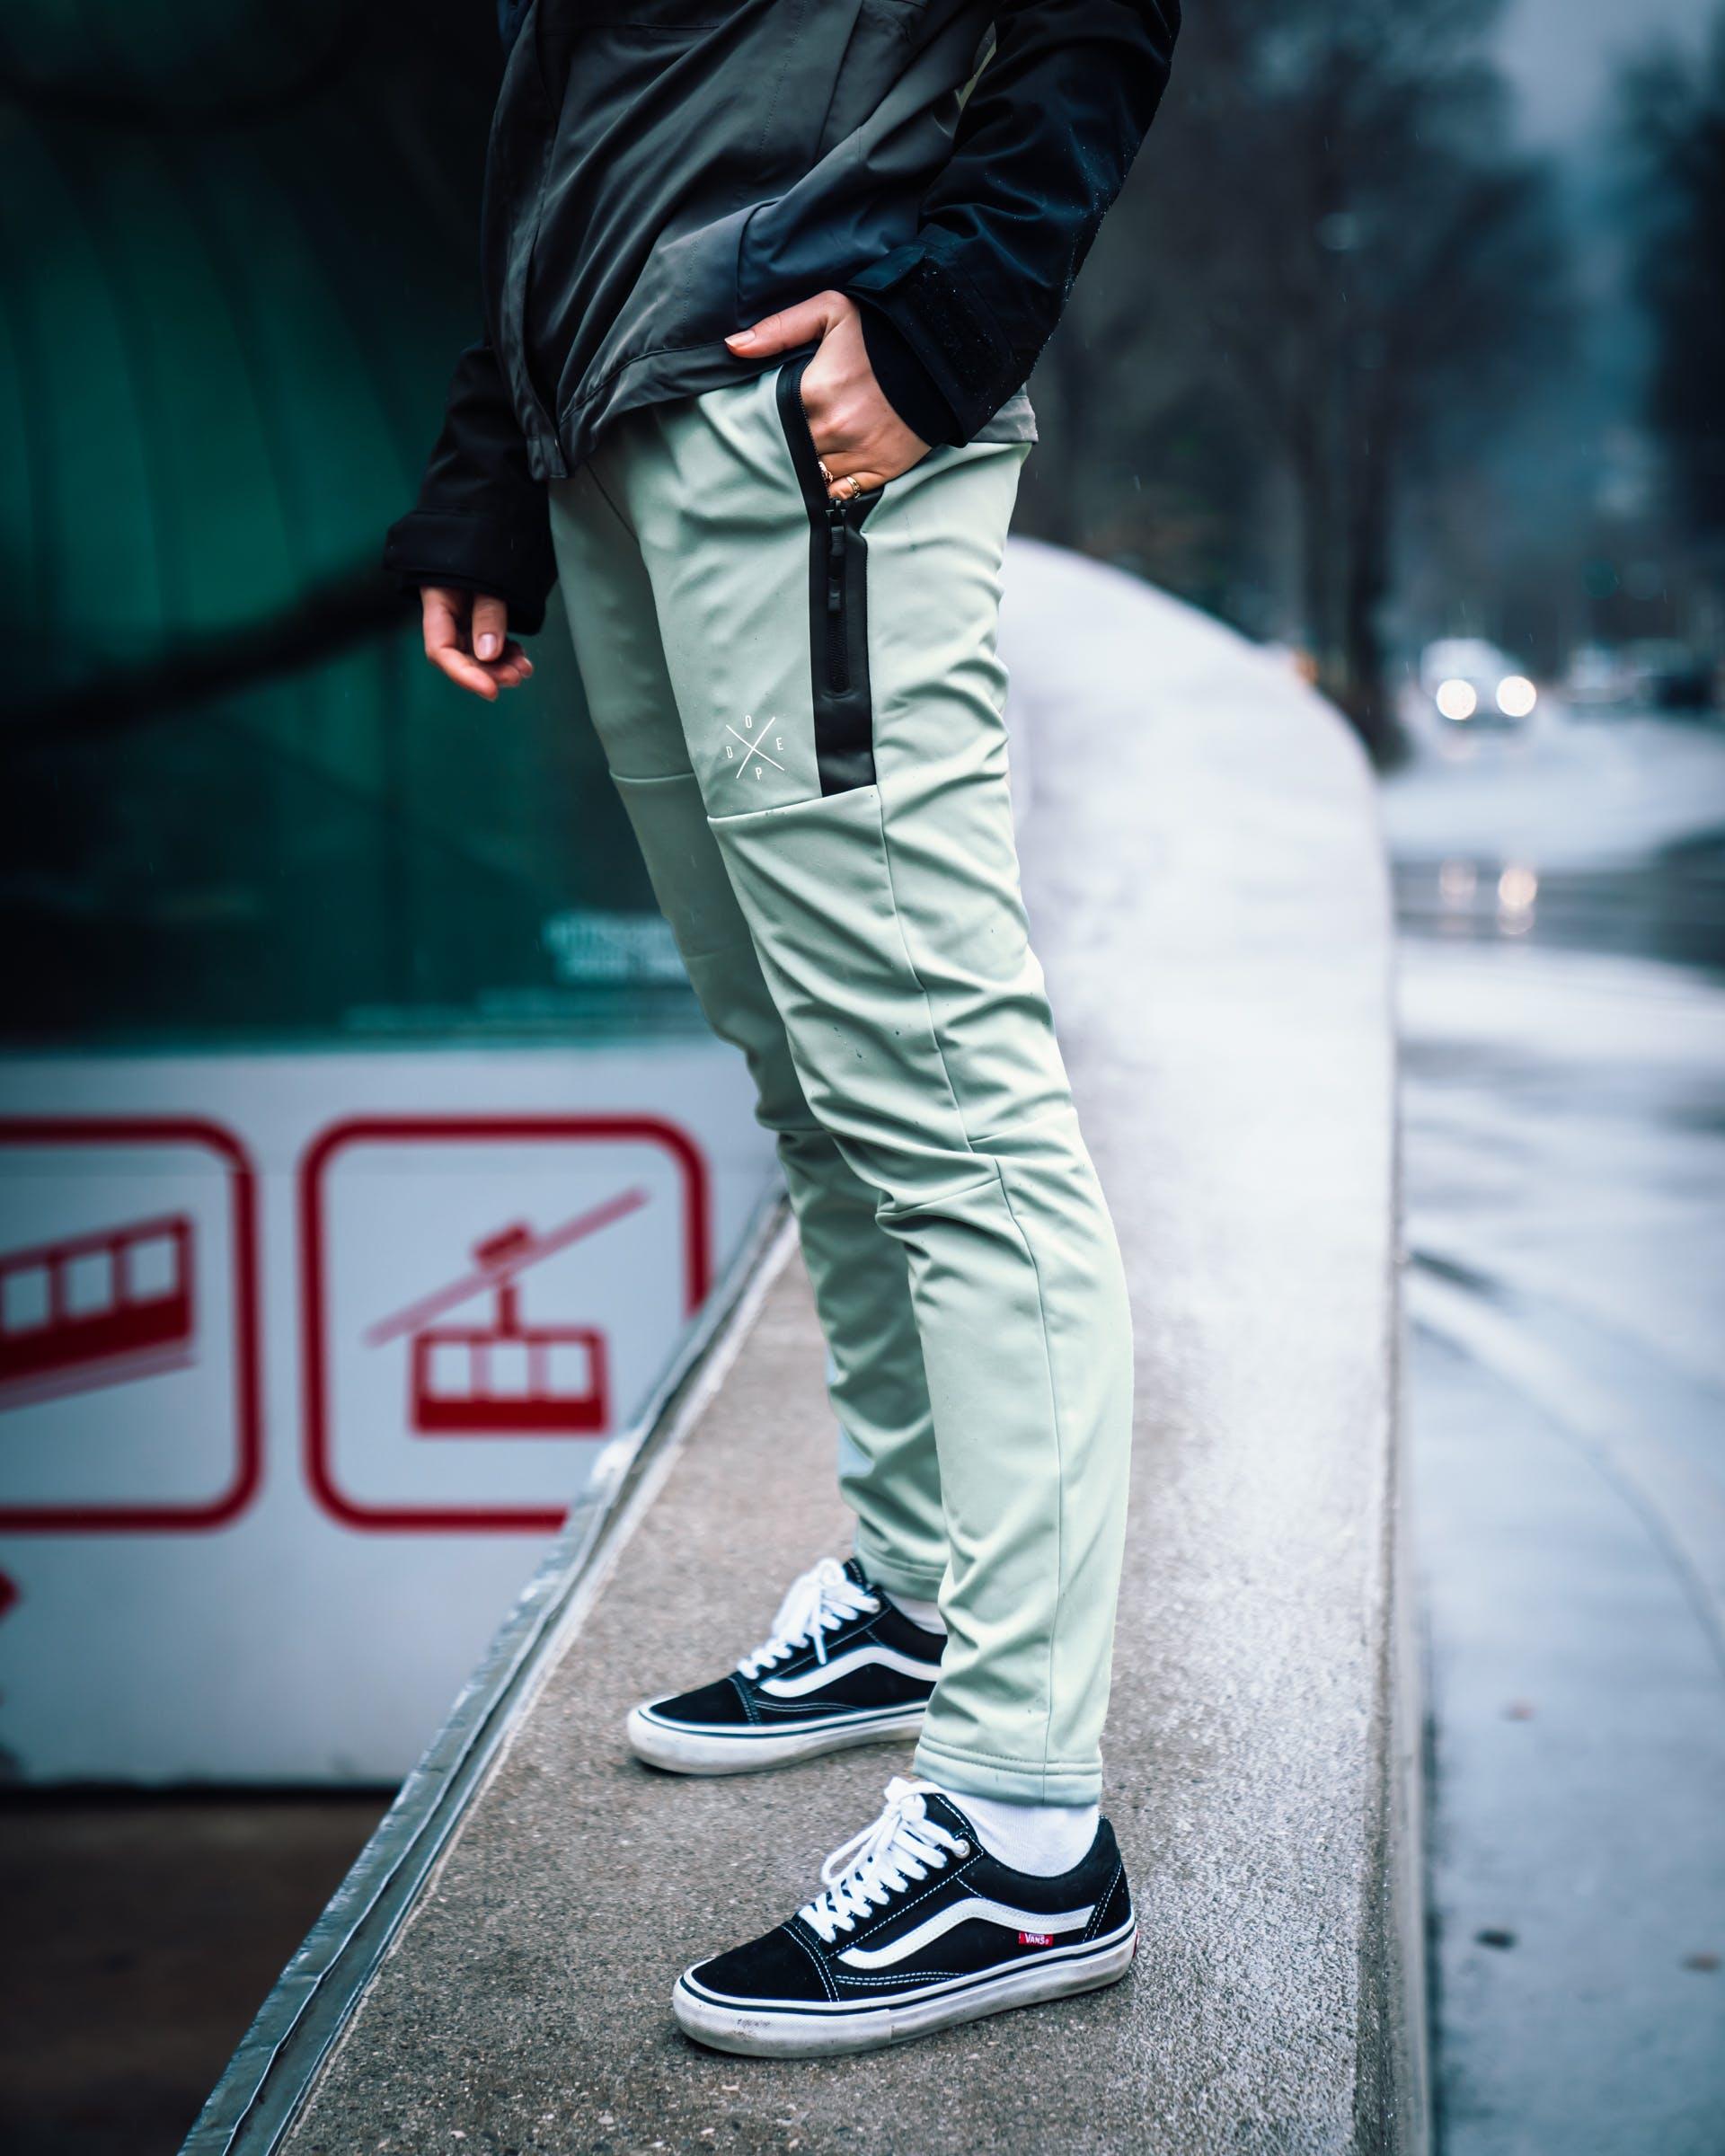 the best walking trousers